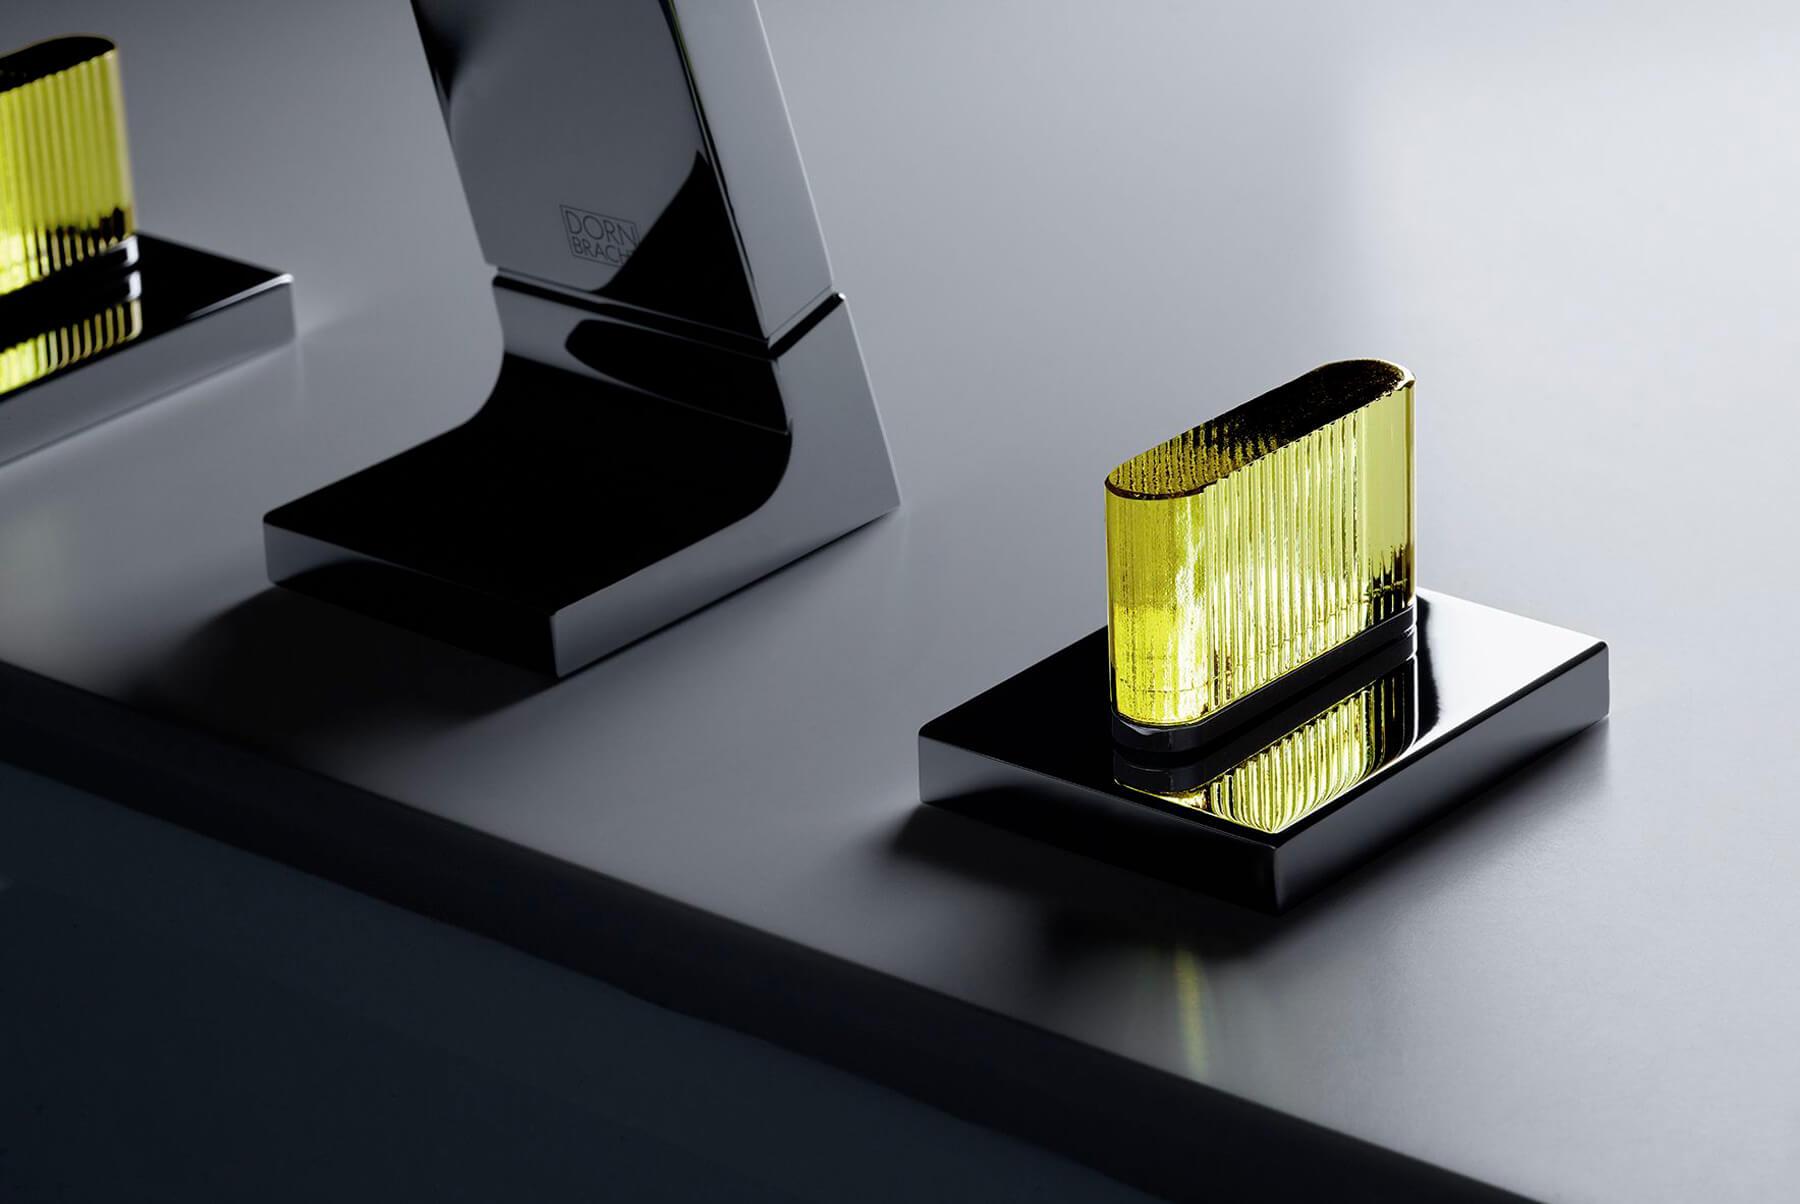 Brassware-Dornbracht-CL1-inset-7-1800x1204